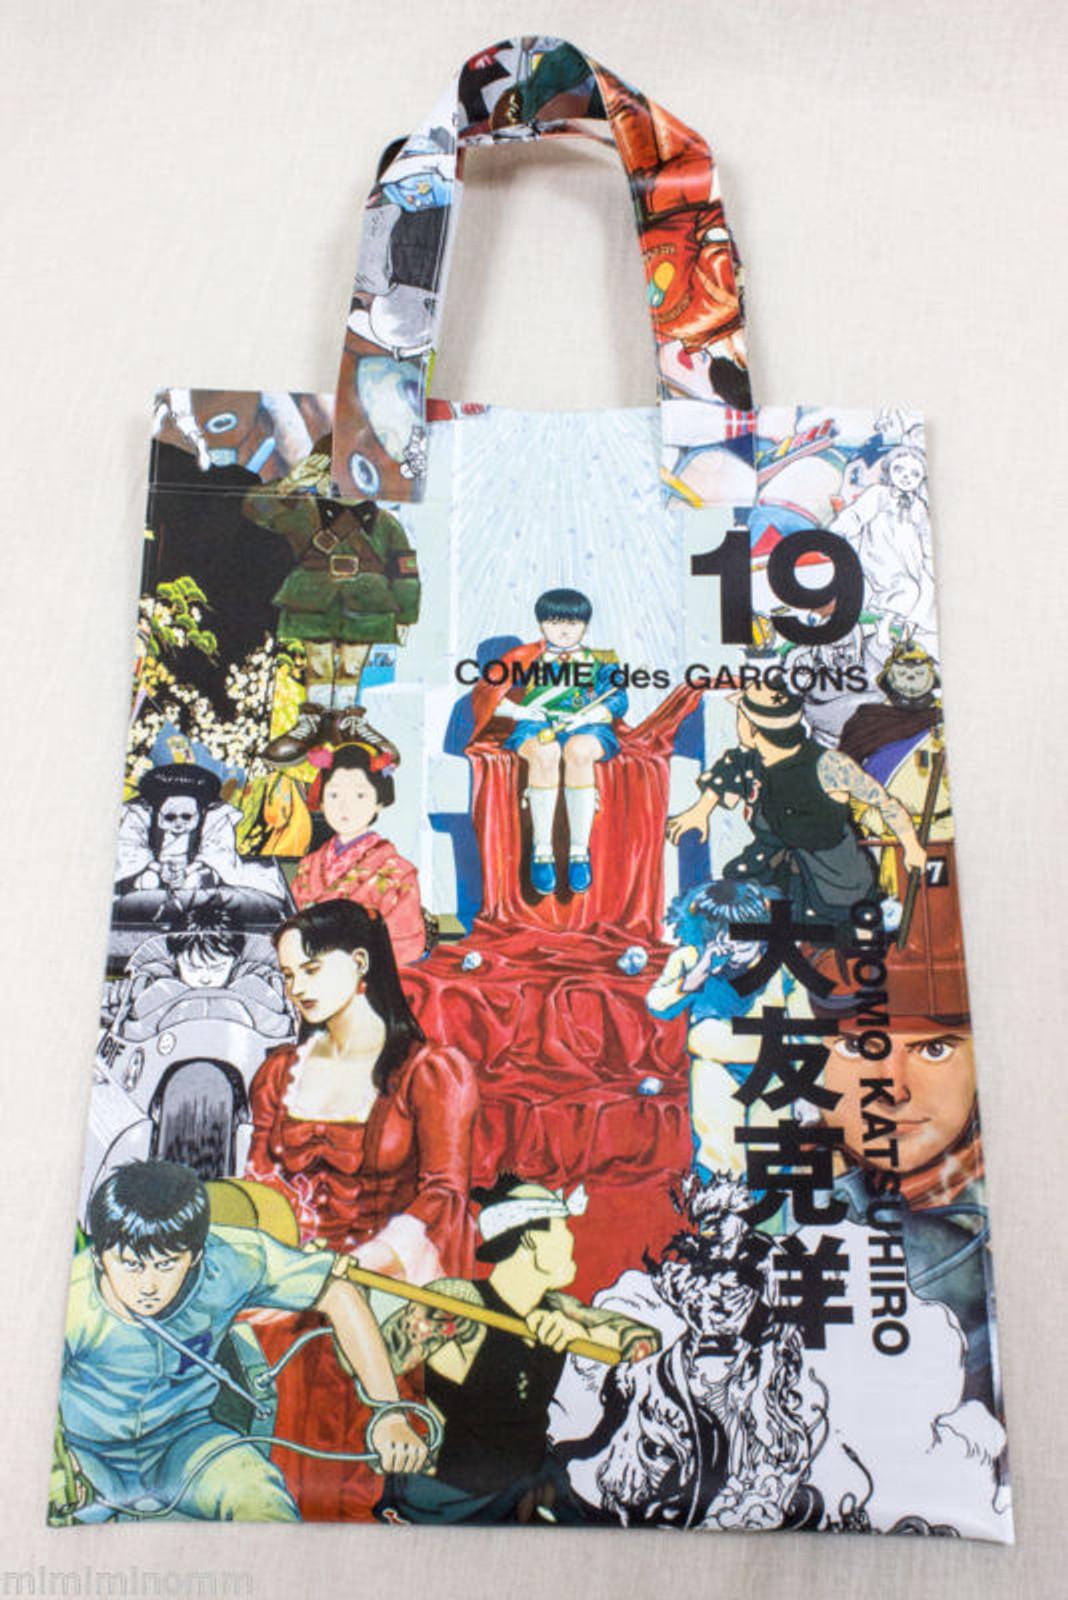 Katsuhiro Otomo x COMME des Garcons Vinyl Hand Bag JAPAN ANIME AKIRA